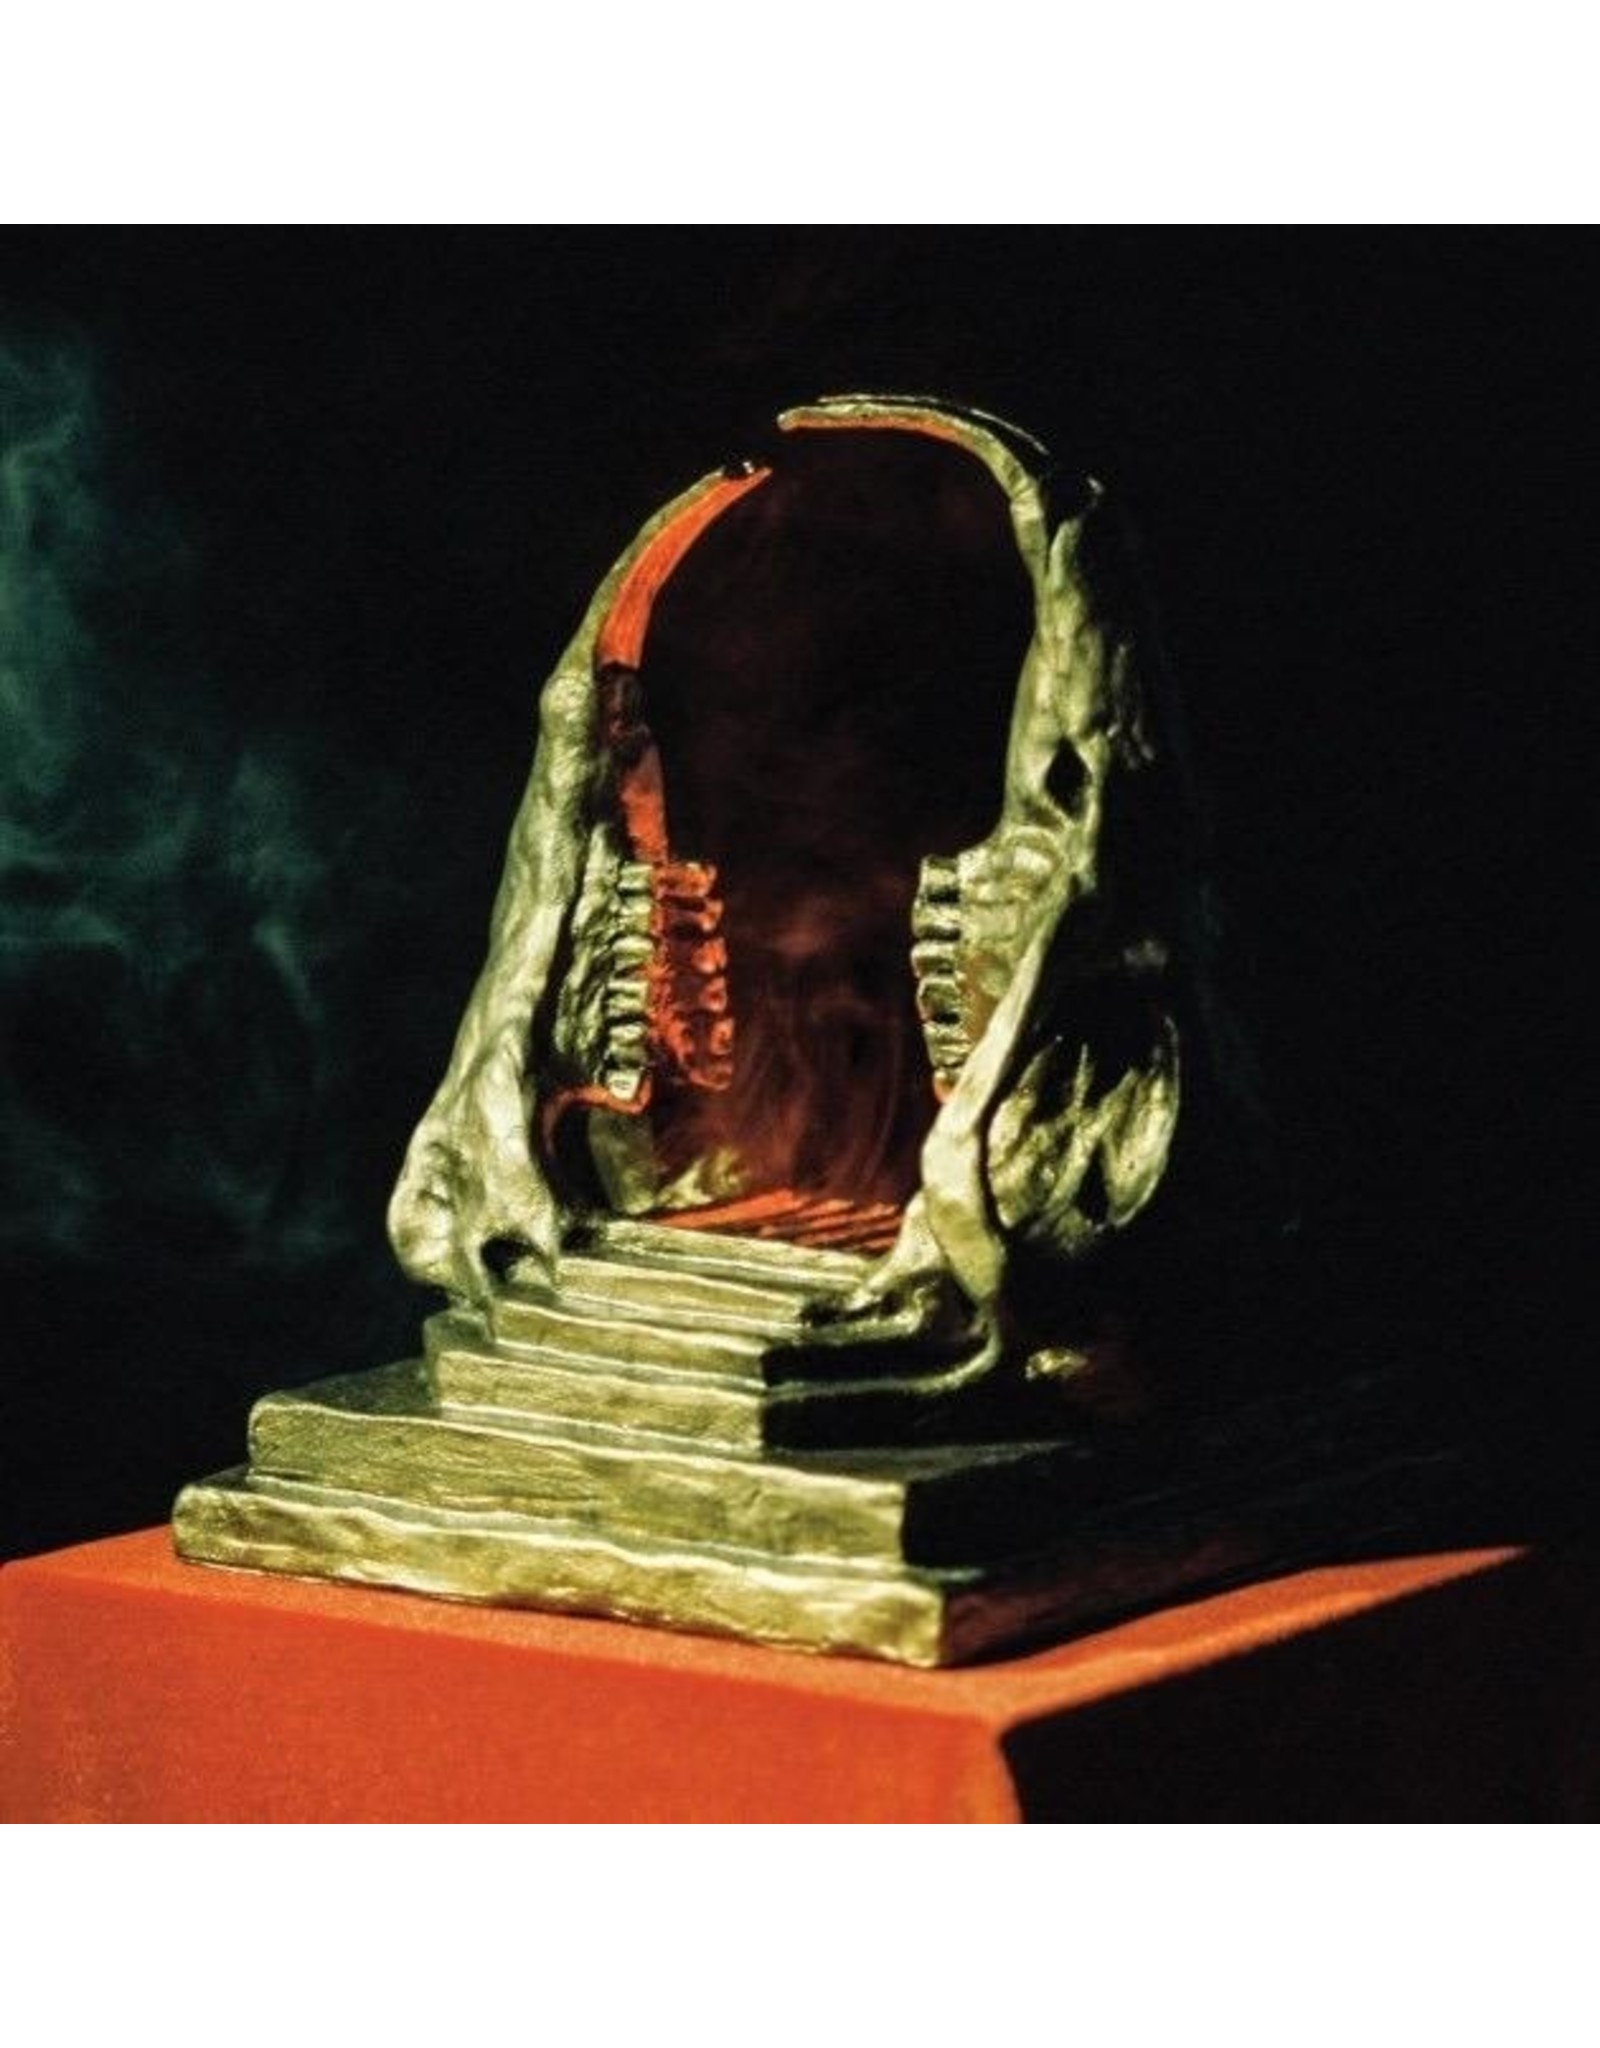 New Vinyl King Gizzard & The Lizard Wizard - Infest The Rat's Nest LP